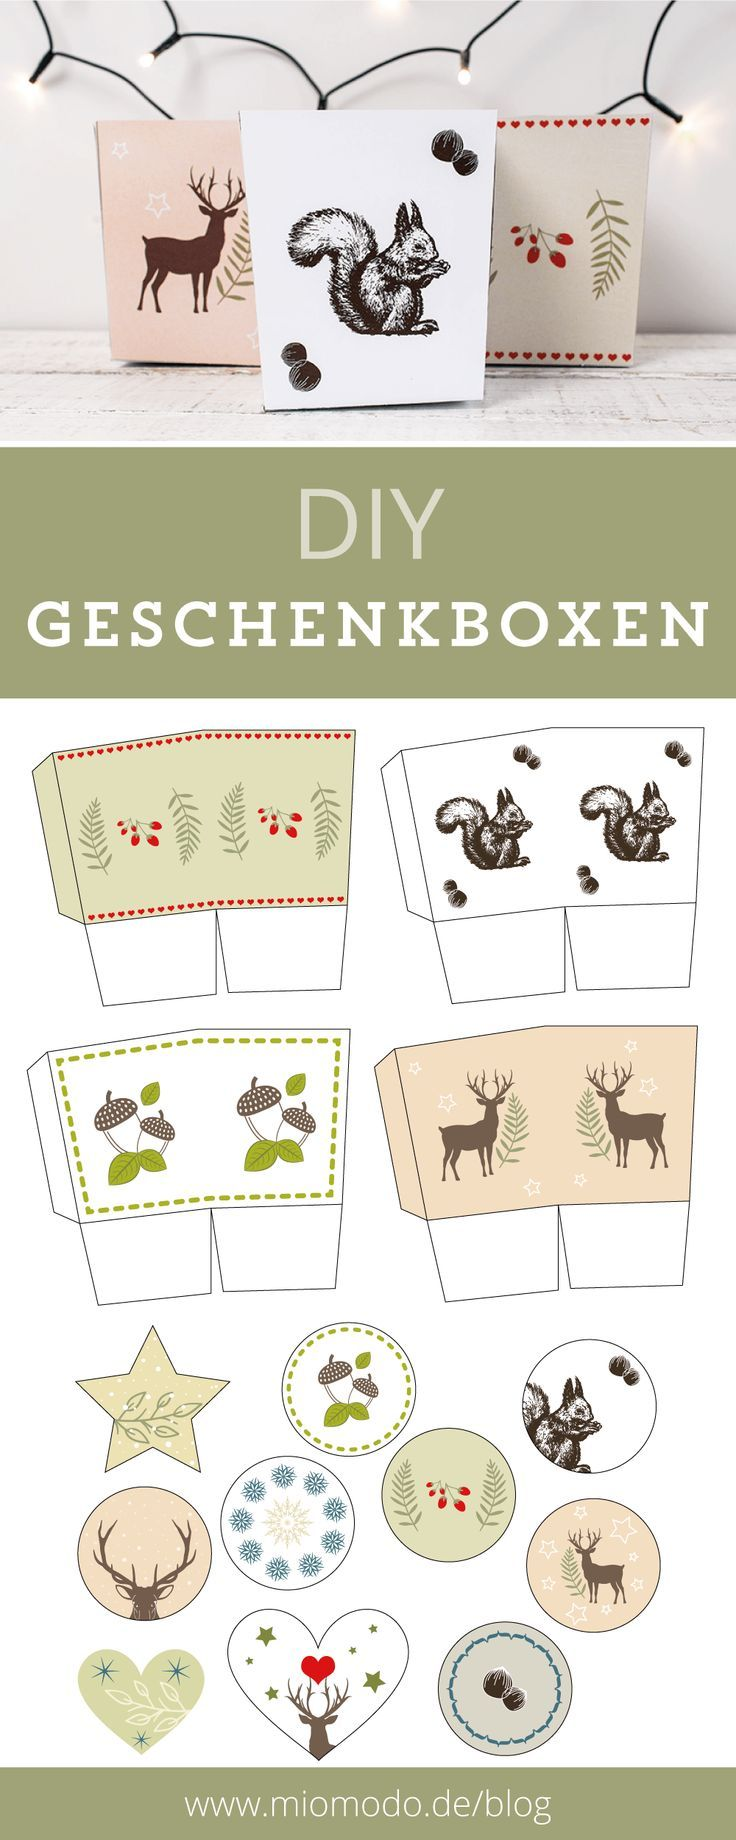 DIY Gift Boxes for Christmas | Christmas DIY, christmas crafting, gift ...  - Verpackungsideen & Geschenkanhänger -